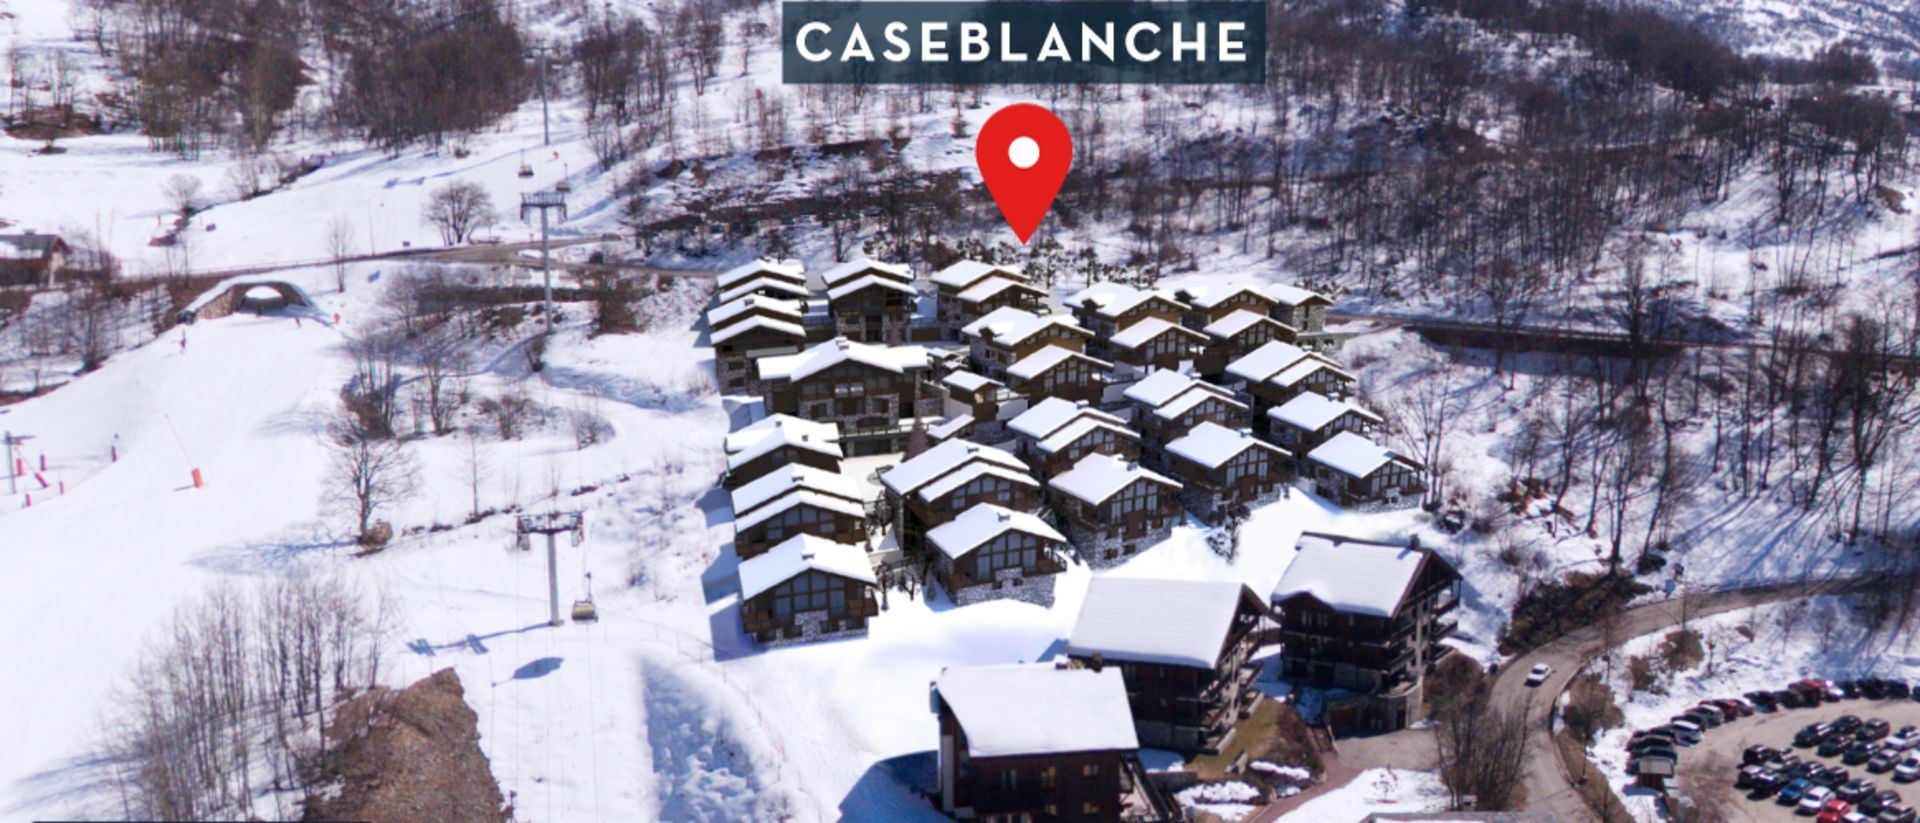 7 Room 12 Pers ski-in ski-out / CASEBLANCHE H7